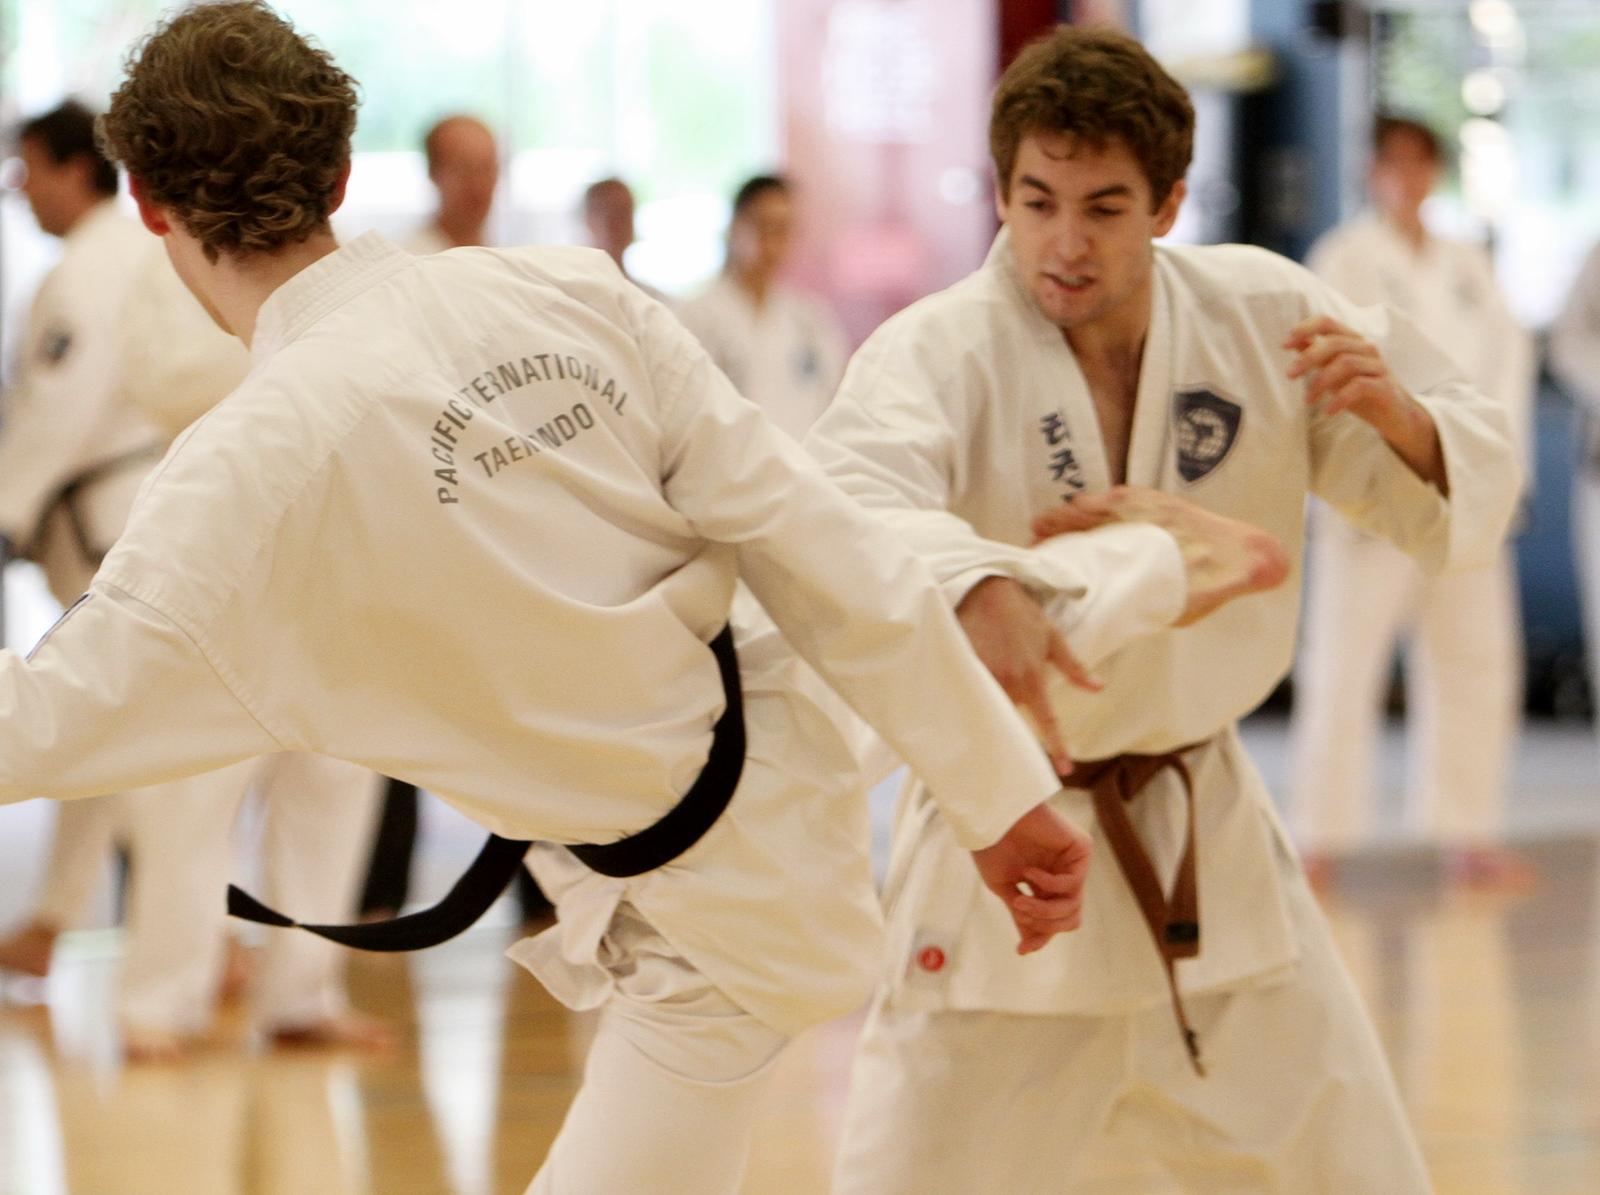 Taekwondo for confidence